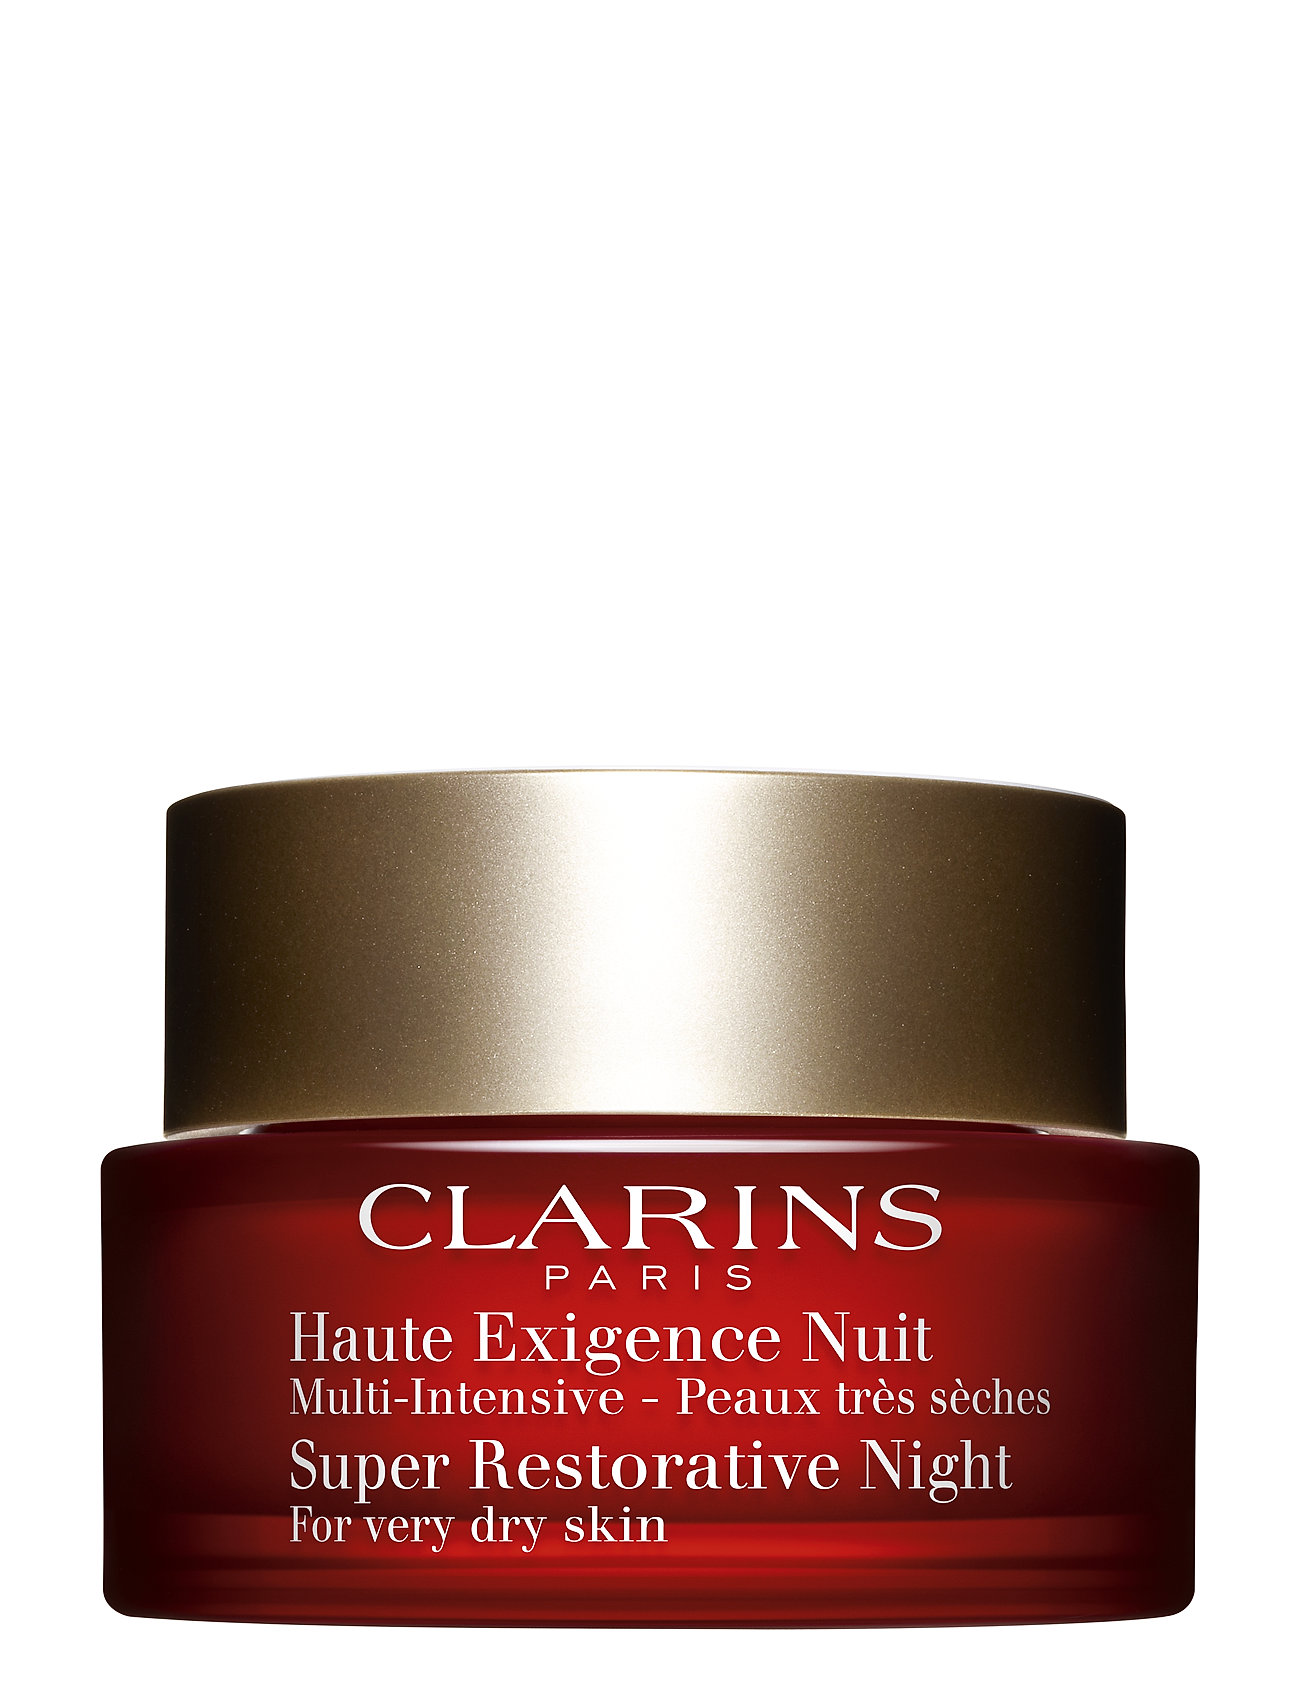 Clarins super restorative night cre fra clarins på boozt.com dk